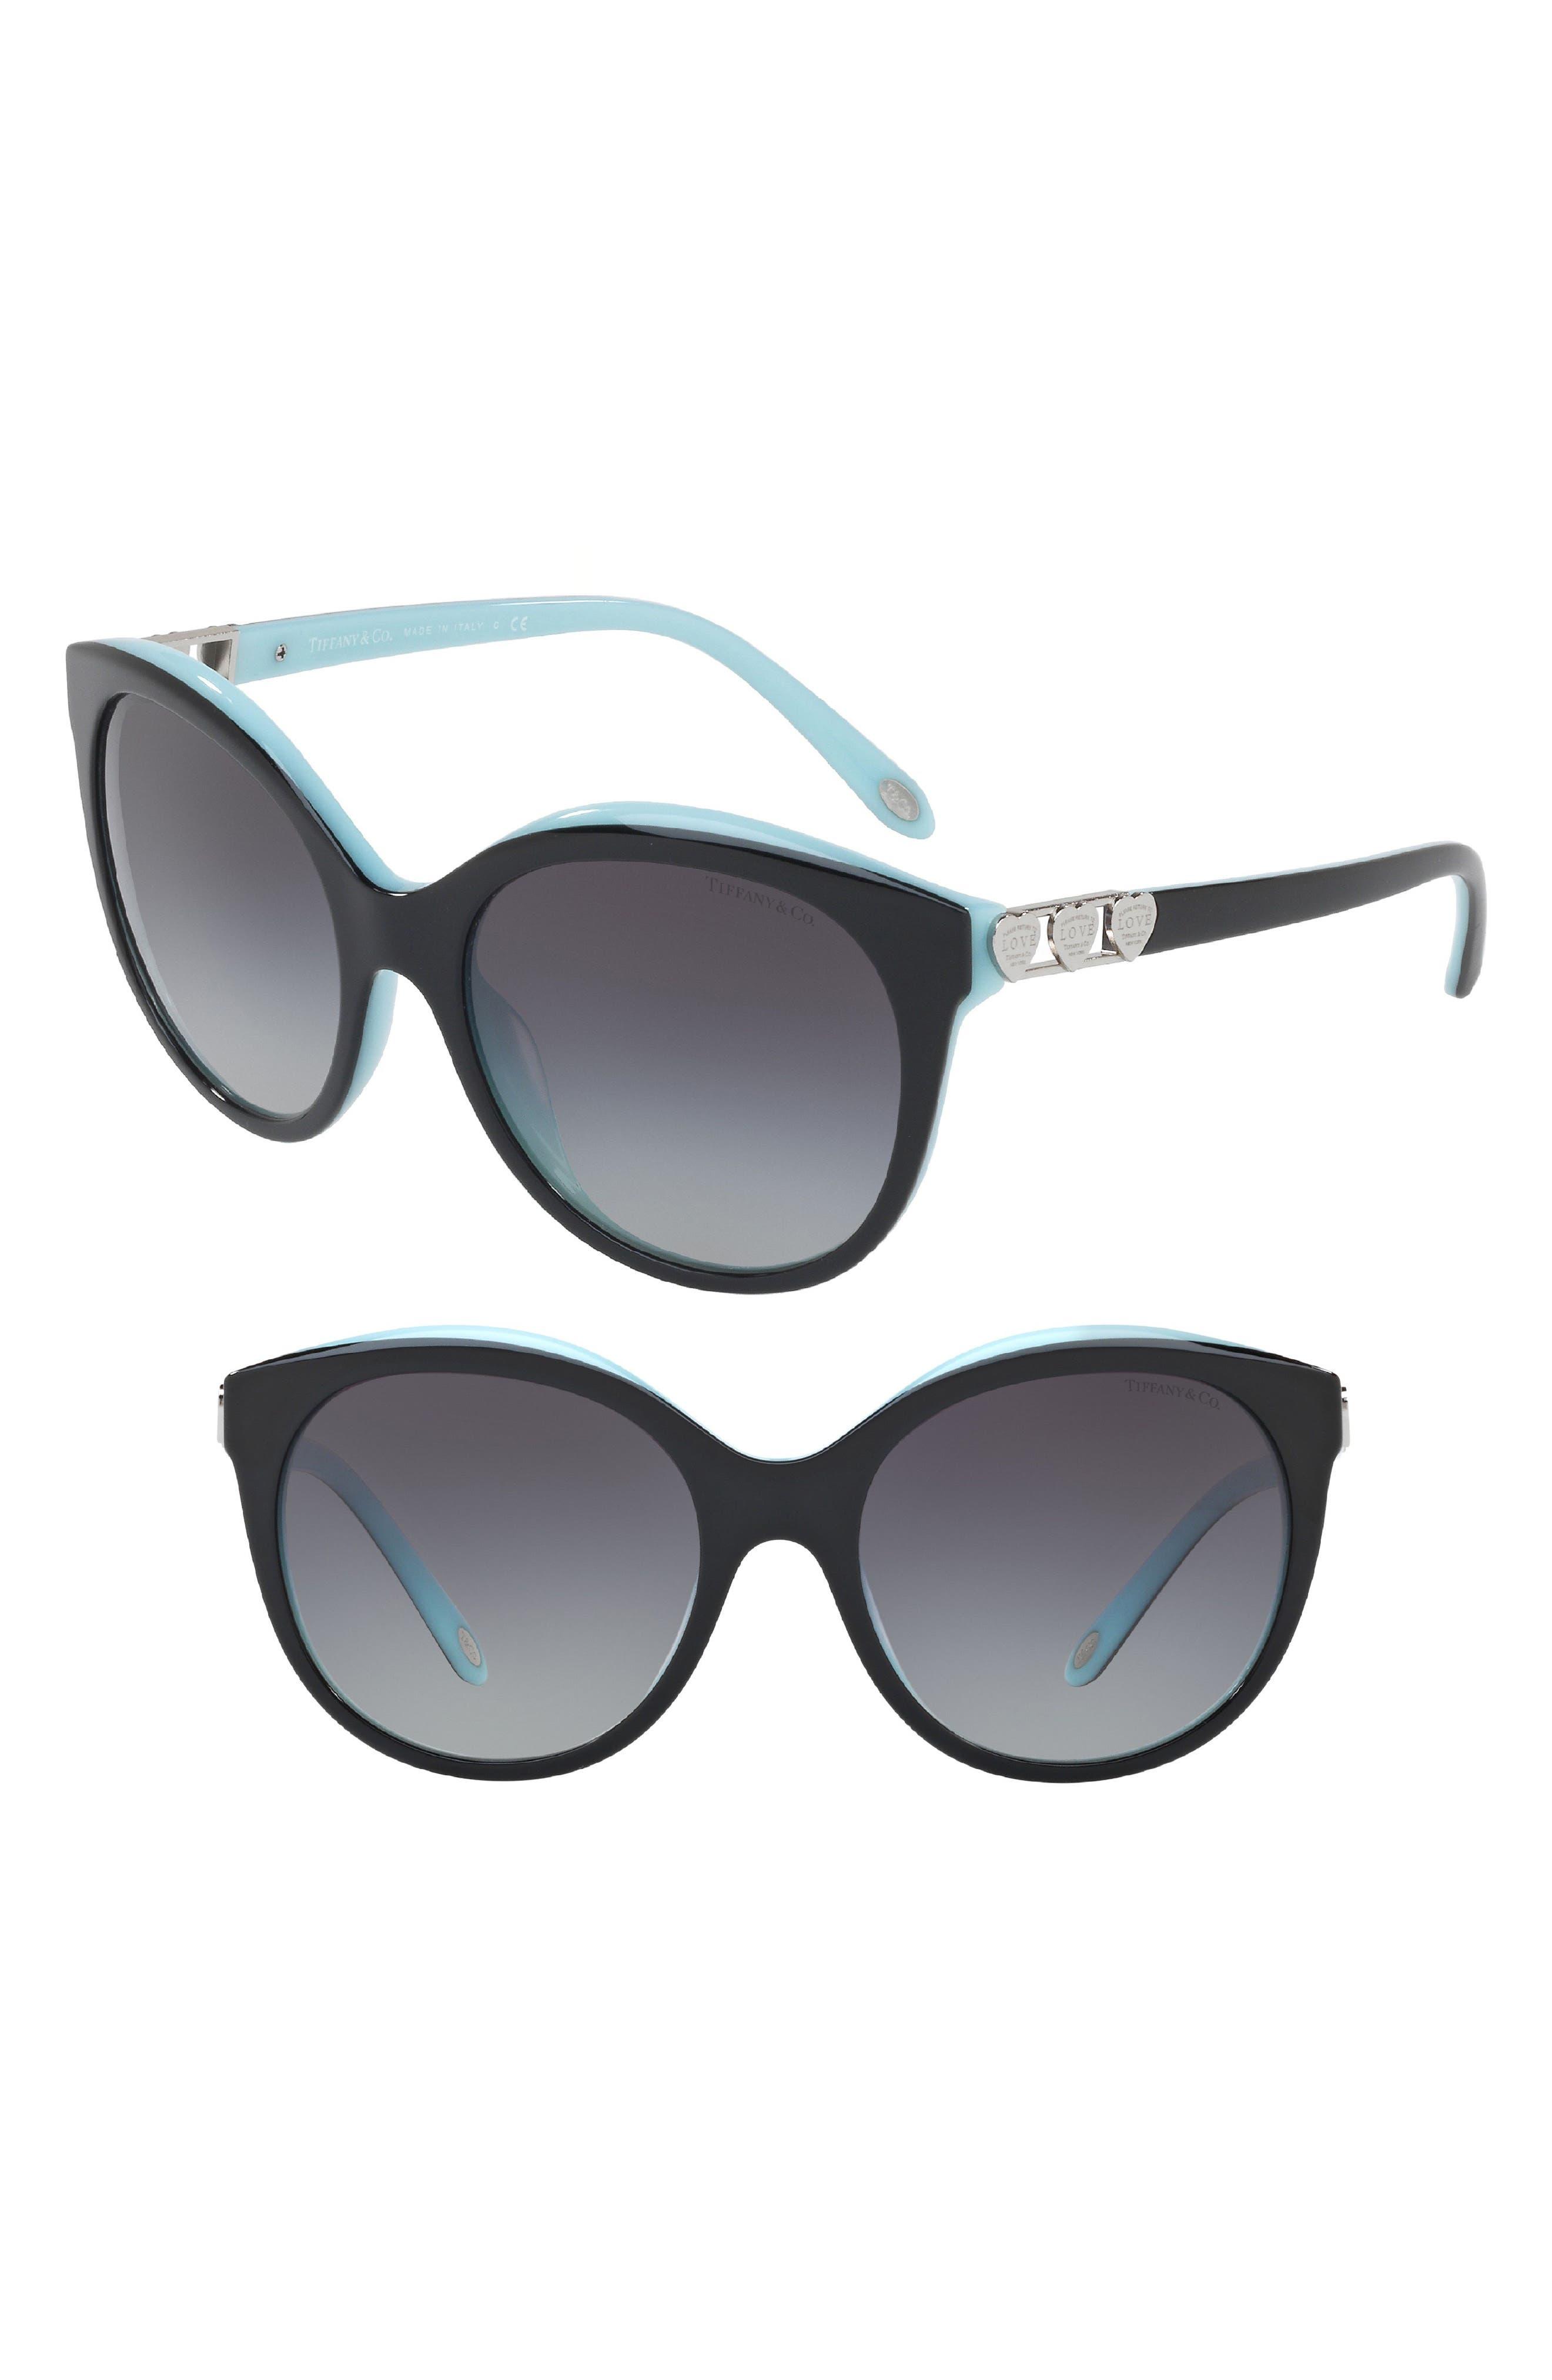 Tiffany 56mm Sunglasses,                         Main,                         color, BLACK/ BLUE GRADIENT